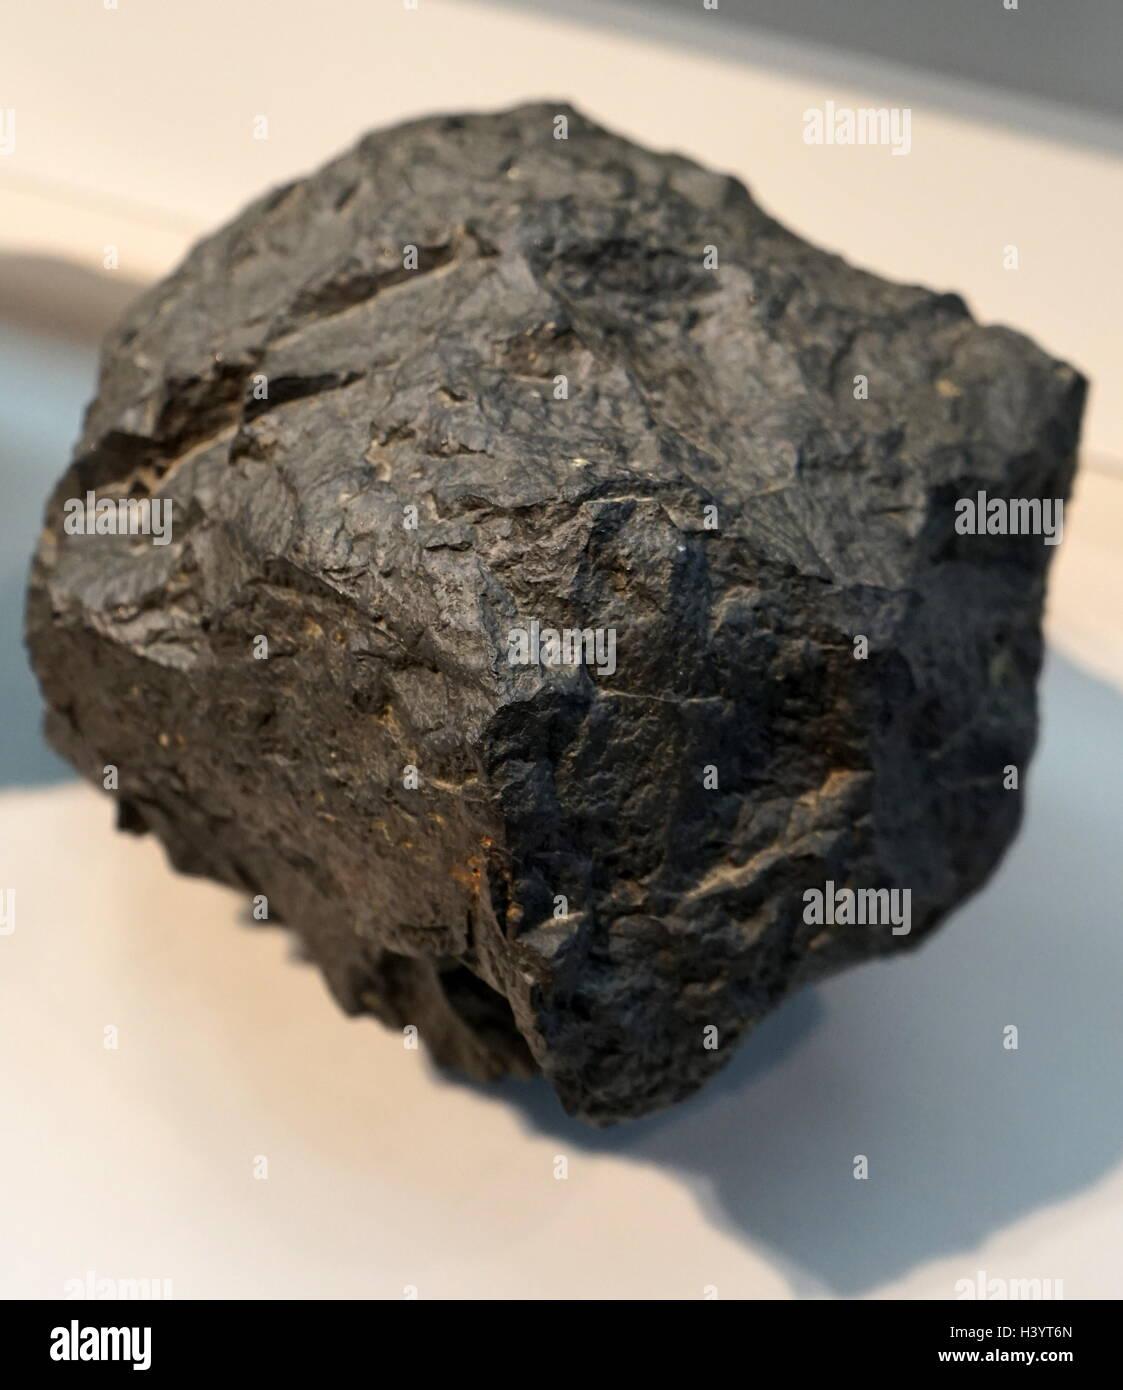 A sample of Oceanic Basalt - Stock Image